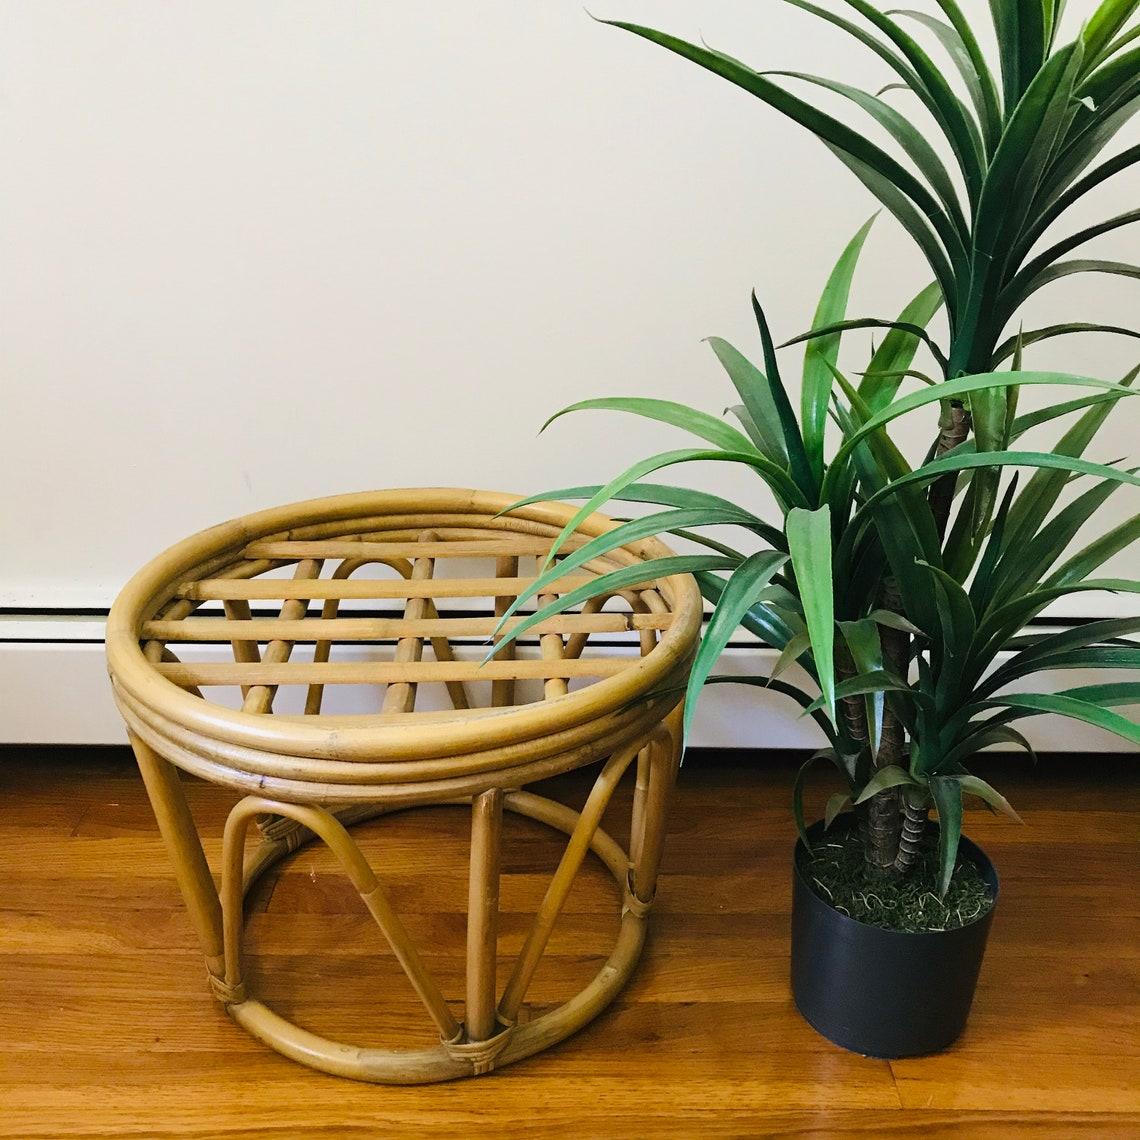 vintage rattan ottoman side table plant stand